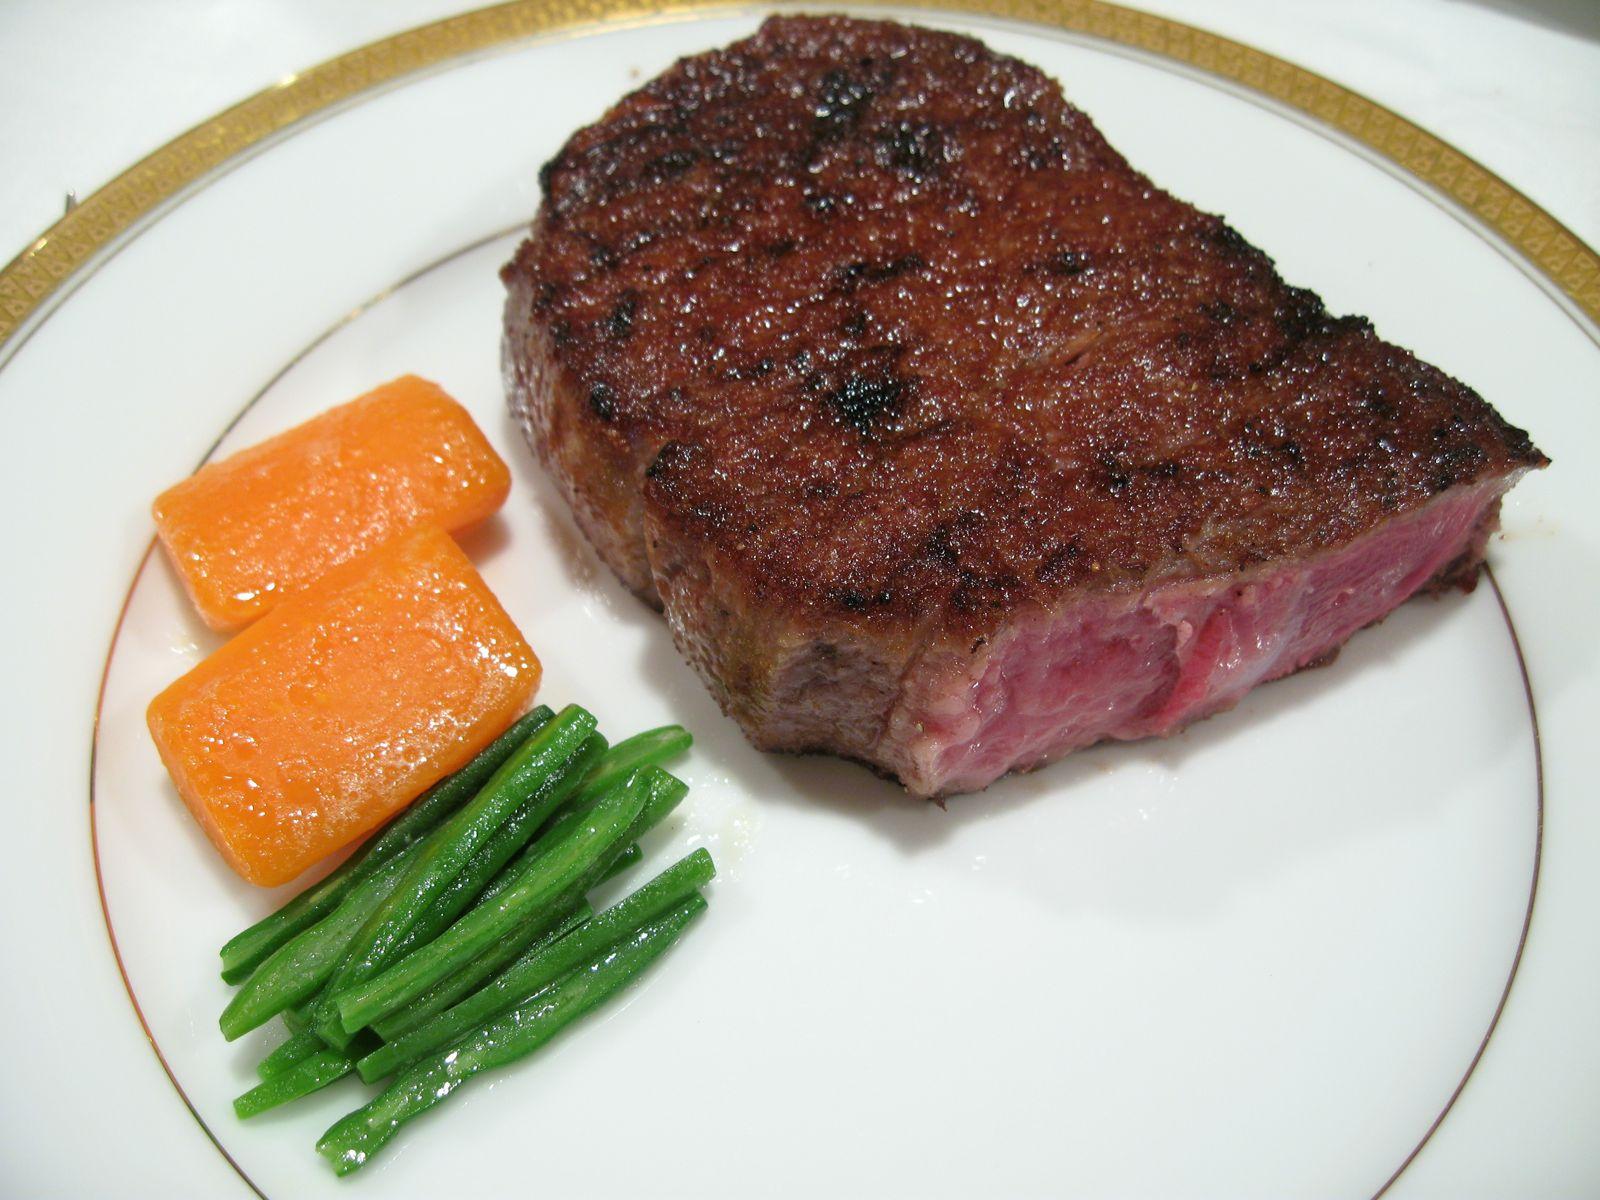 Half a slice of 16oz Kobe Beef